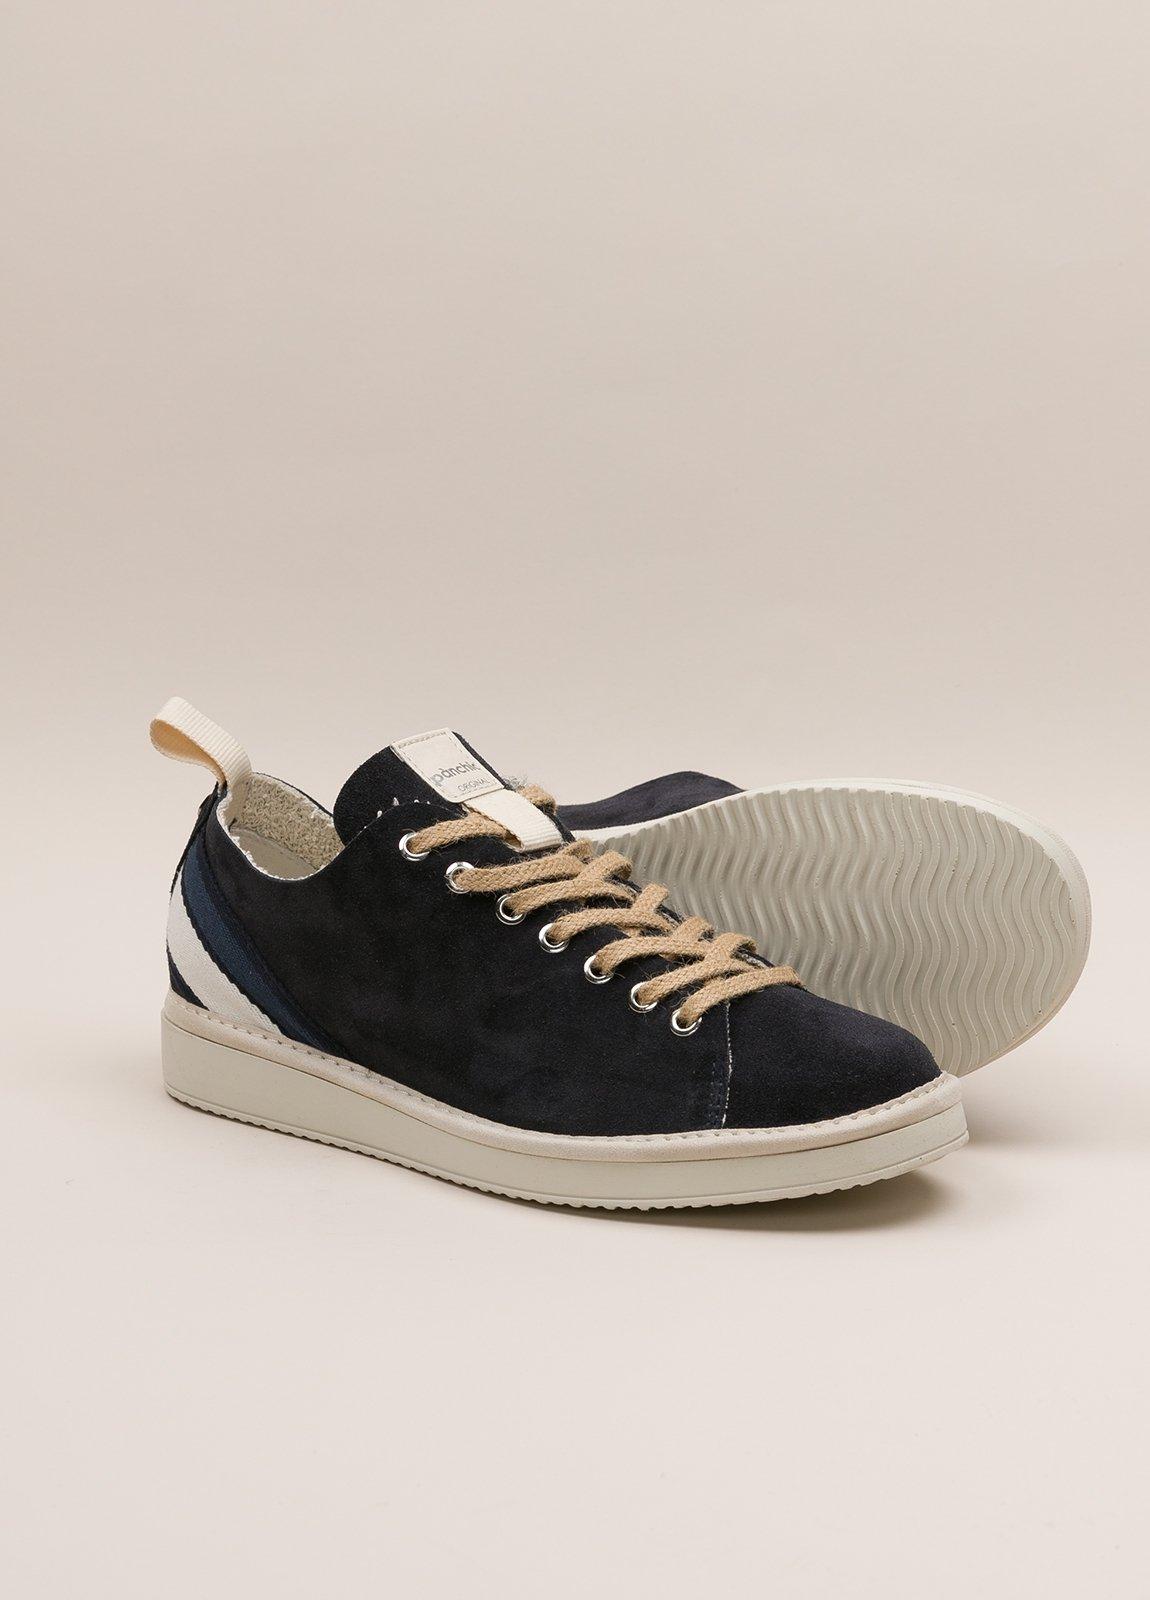 Sneakers PANCHIC marino - Ítem2